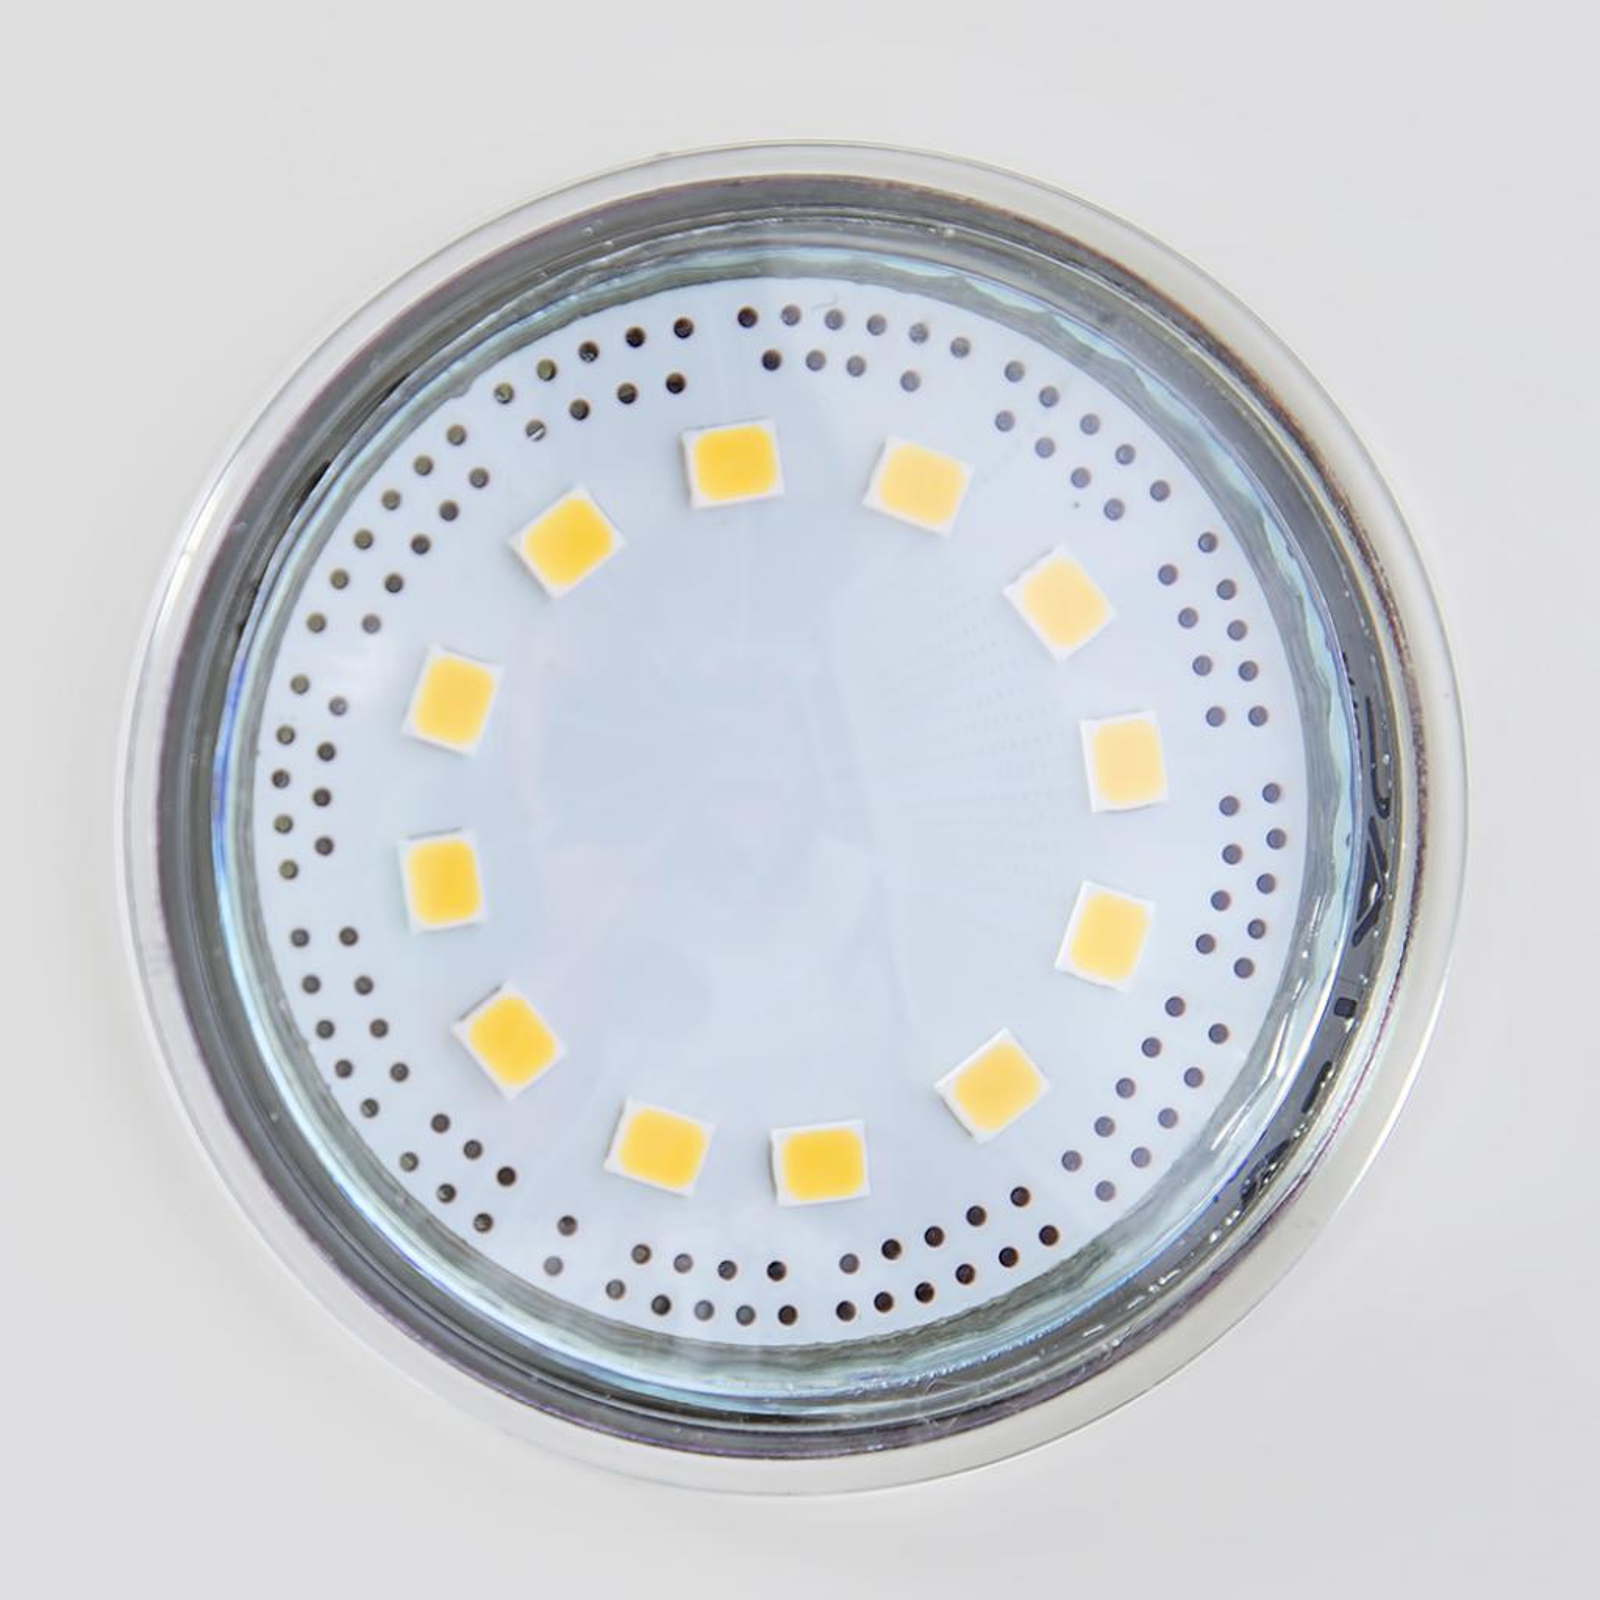 Вытяжка кухонная PERFELLI TL 5103 IV LED изображение 5